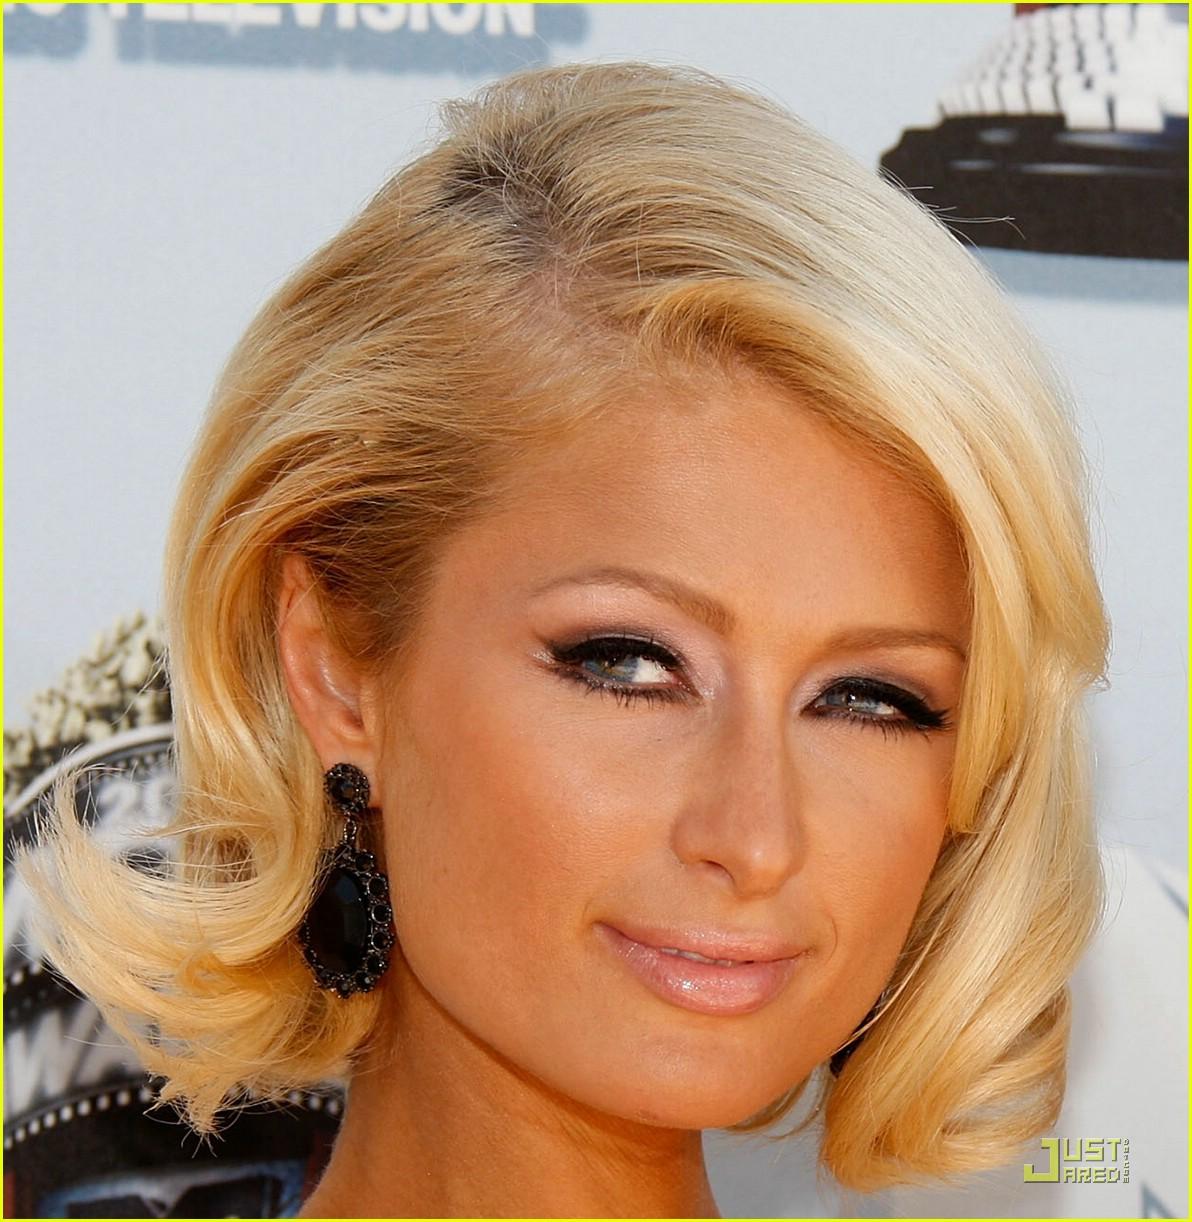 Paris Hilton - MTV Movie Awards 2008: Photo 1172551   Paris Hilton ... Paris Hilton